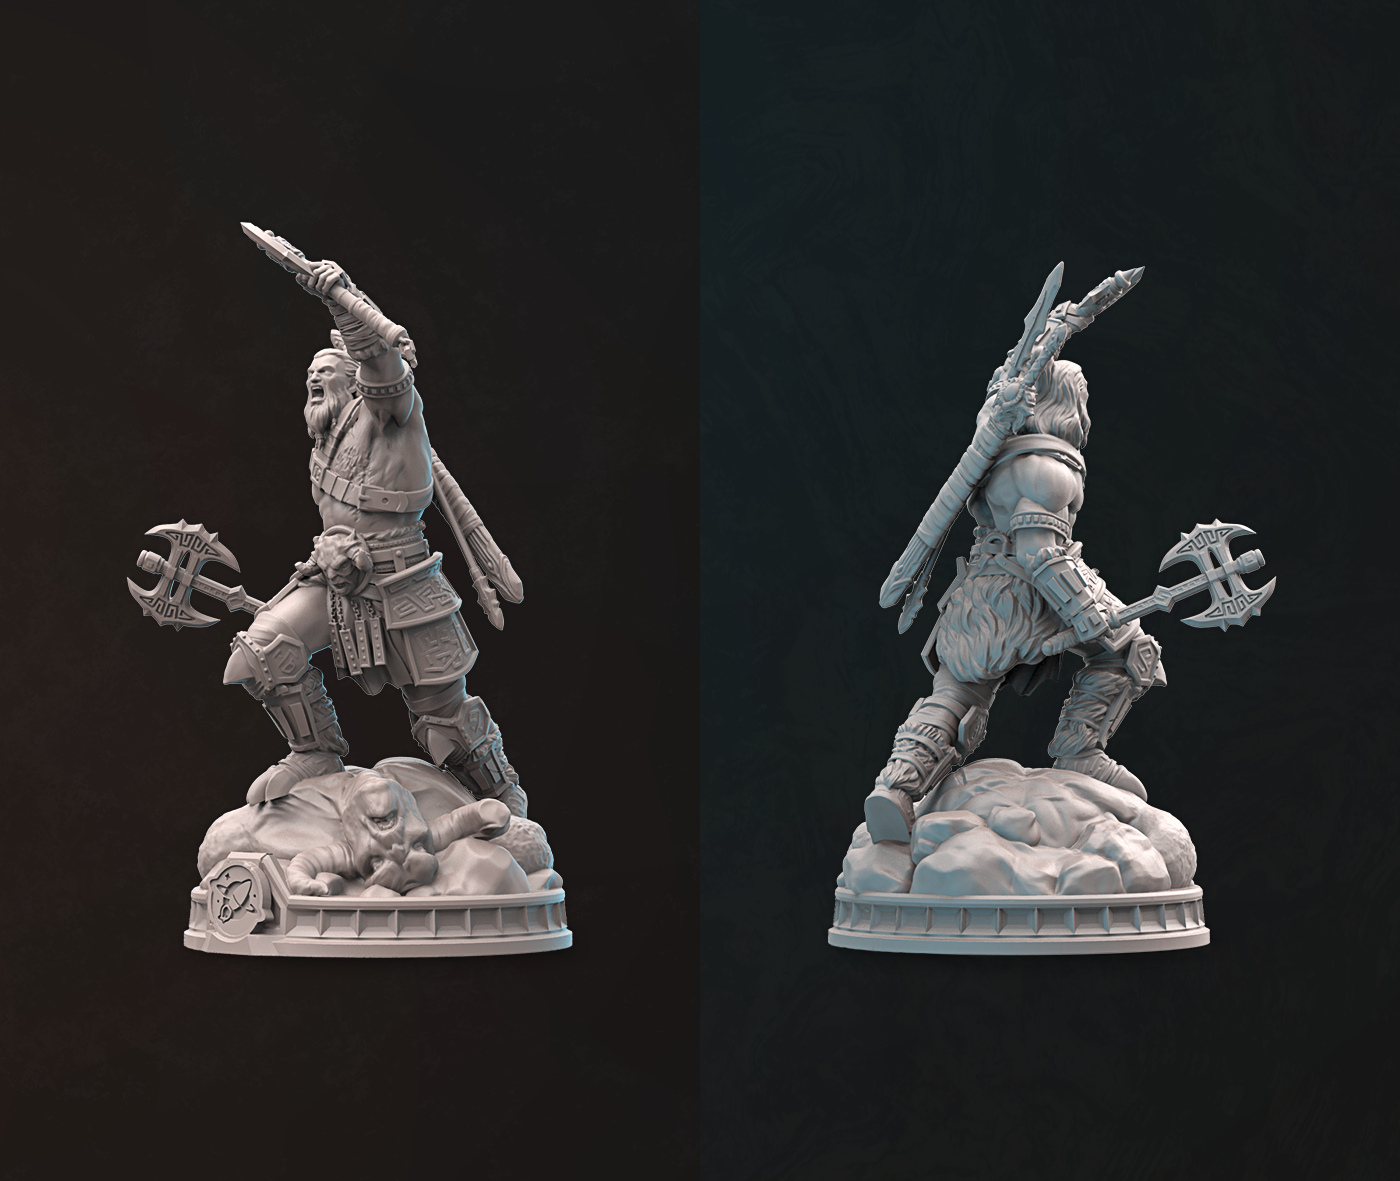 3D Model - Sculpture by RocketBrush Studio